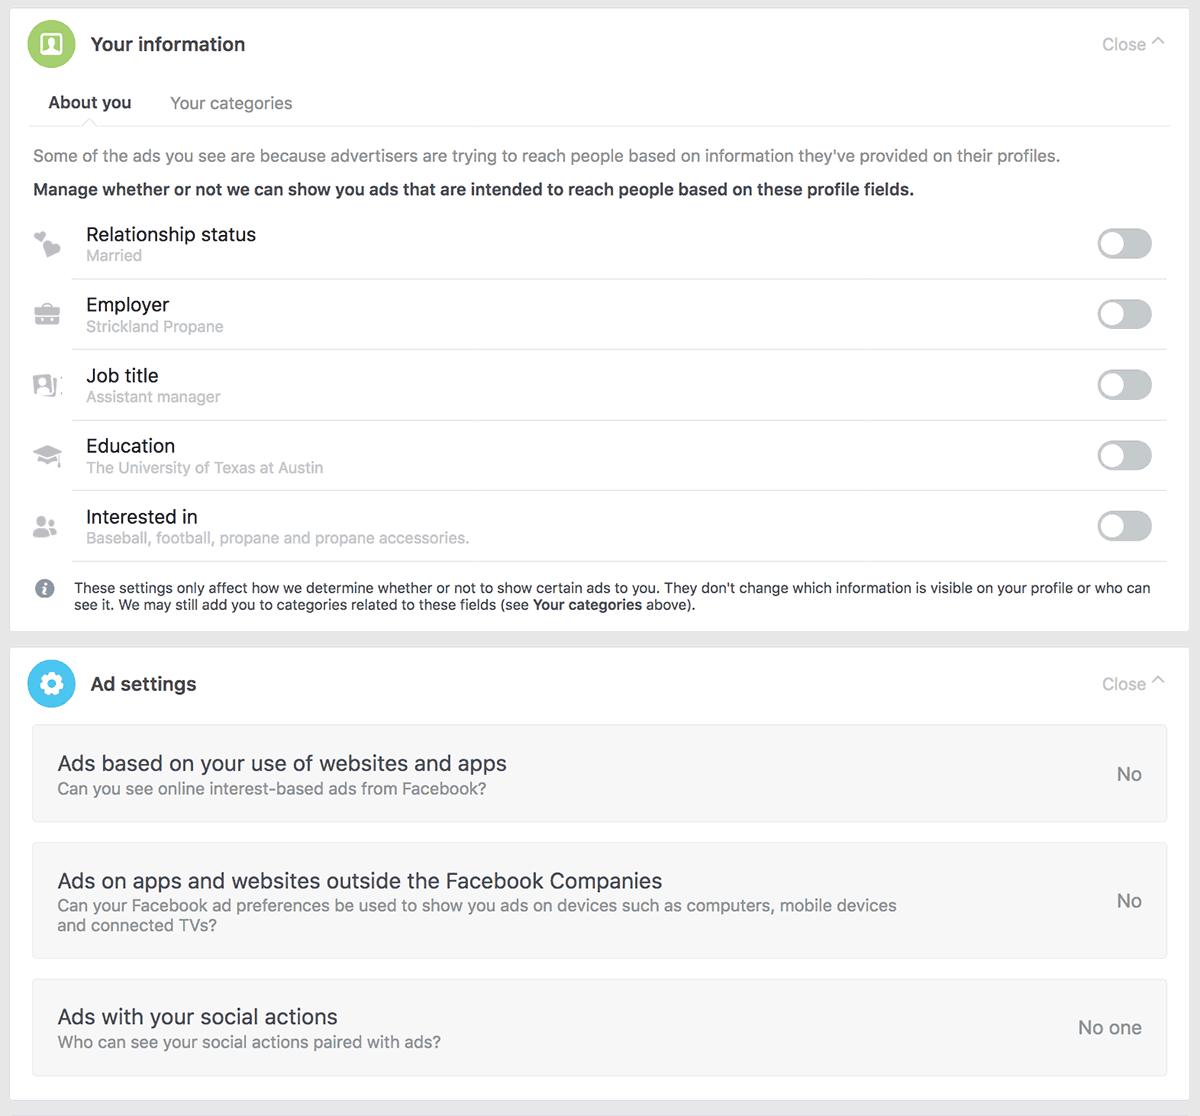 screenshots_ad_settings_your_info.png